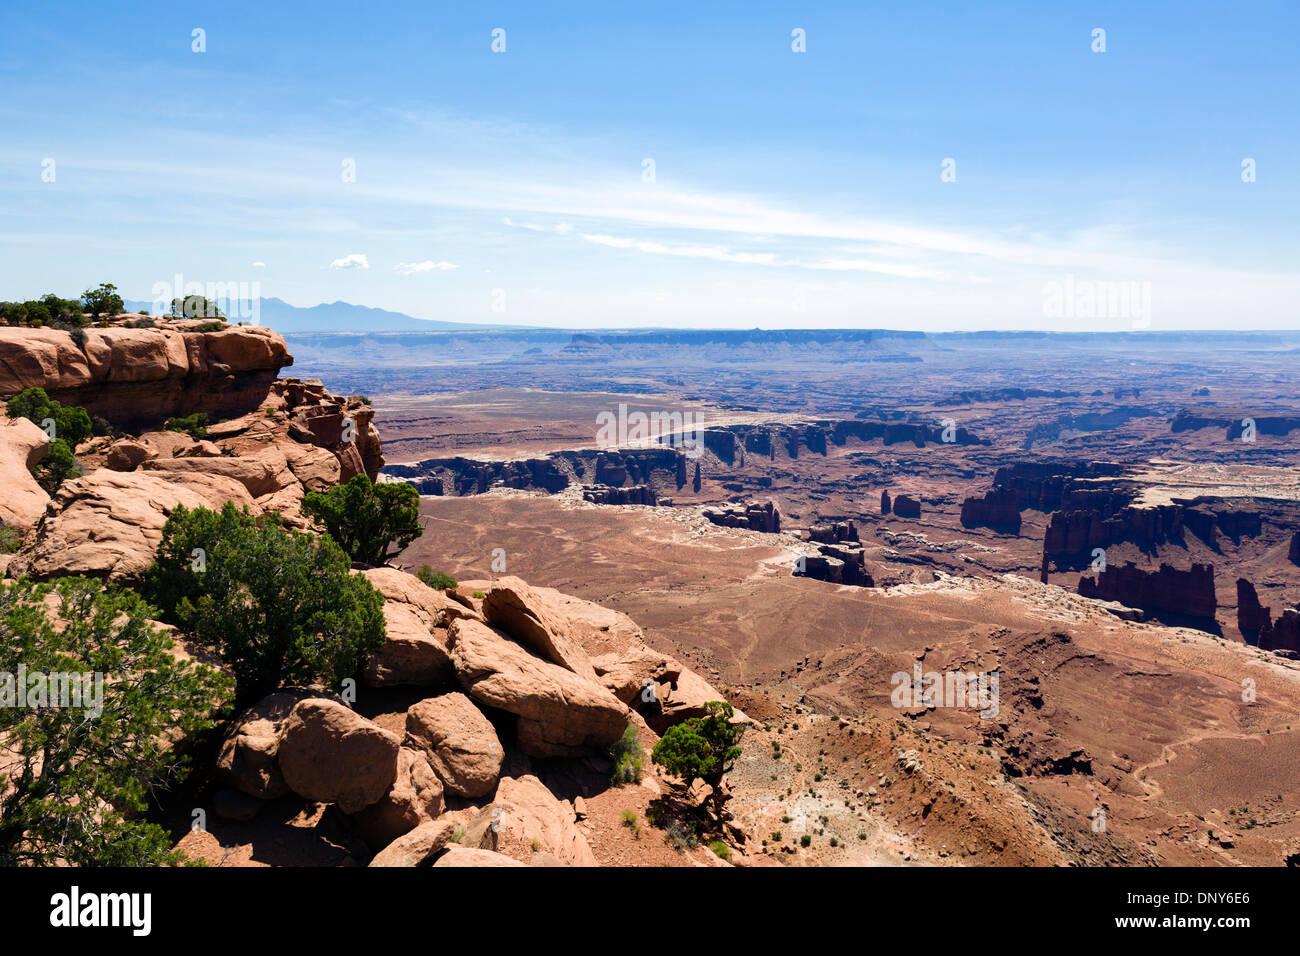 Grand View Point, Island in the Sky, Canyonlands National Park, Utah, USA Stockbild